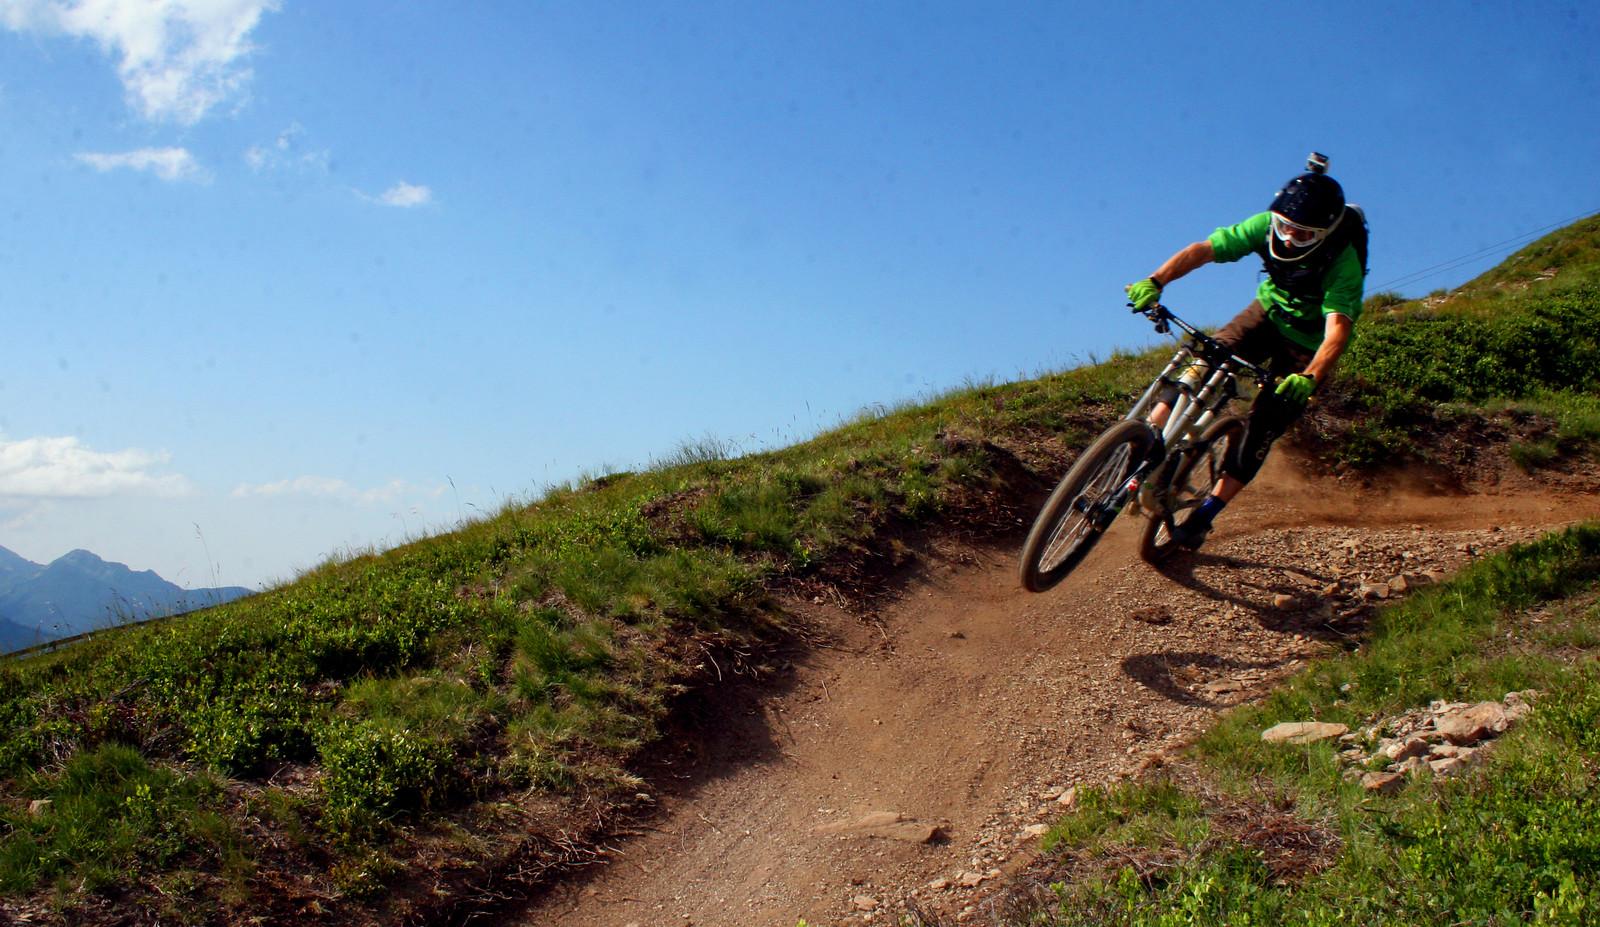 Bike Circus - The Gap - Mountain Biking Pictures - Vital MTB